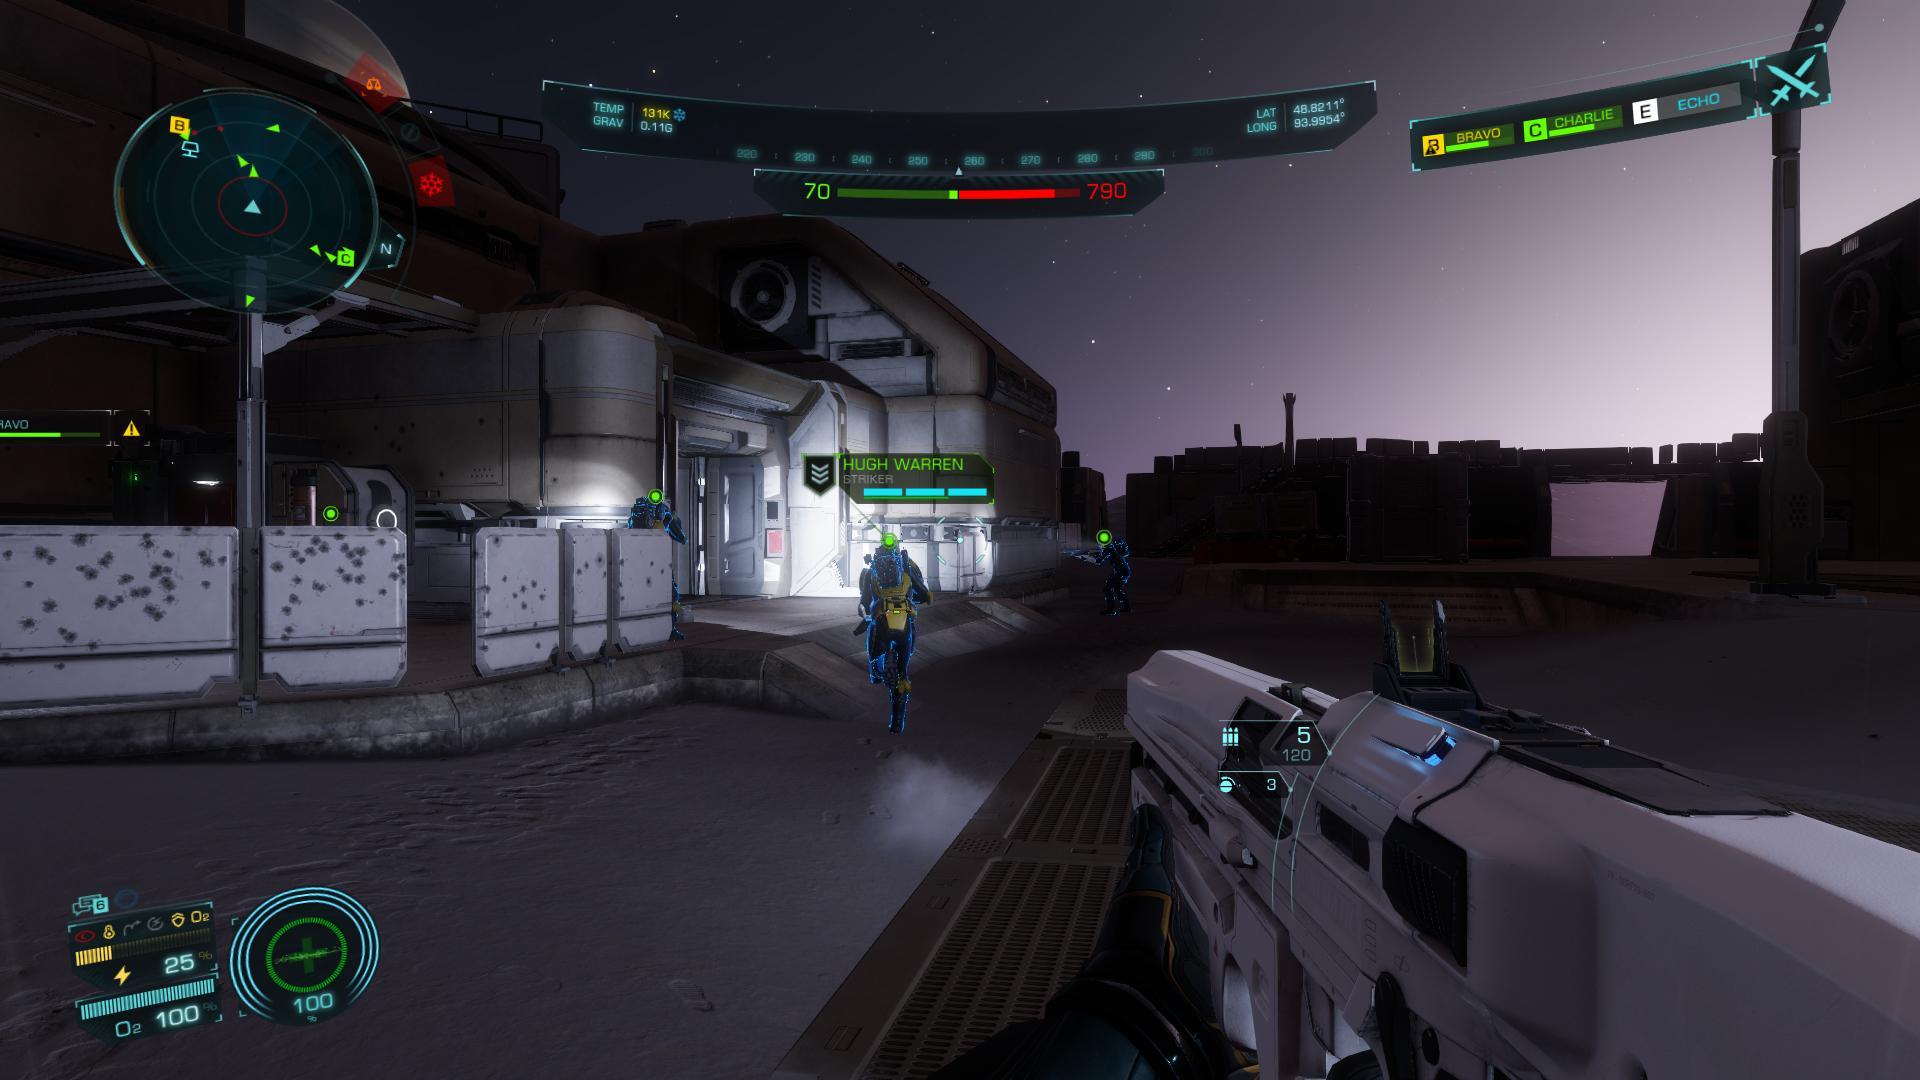 Screenshot Of An Elite Dangerous Odyssey Conflict Zone Fire Fight